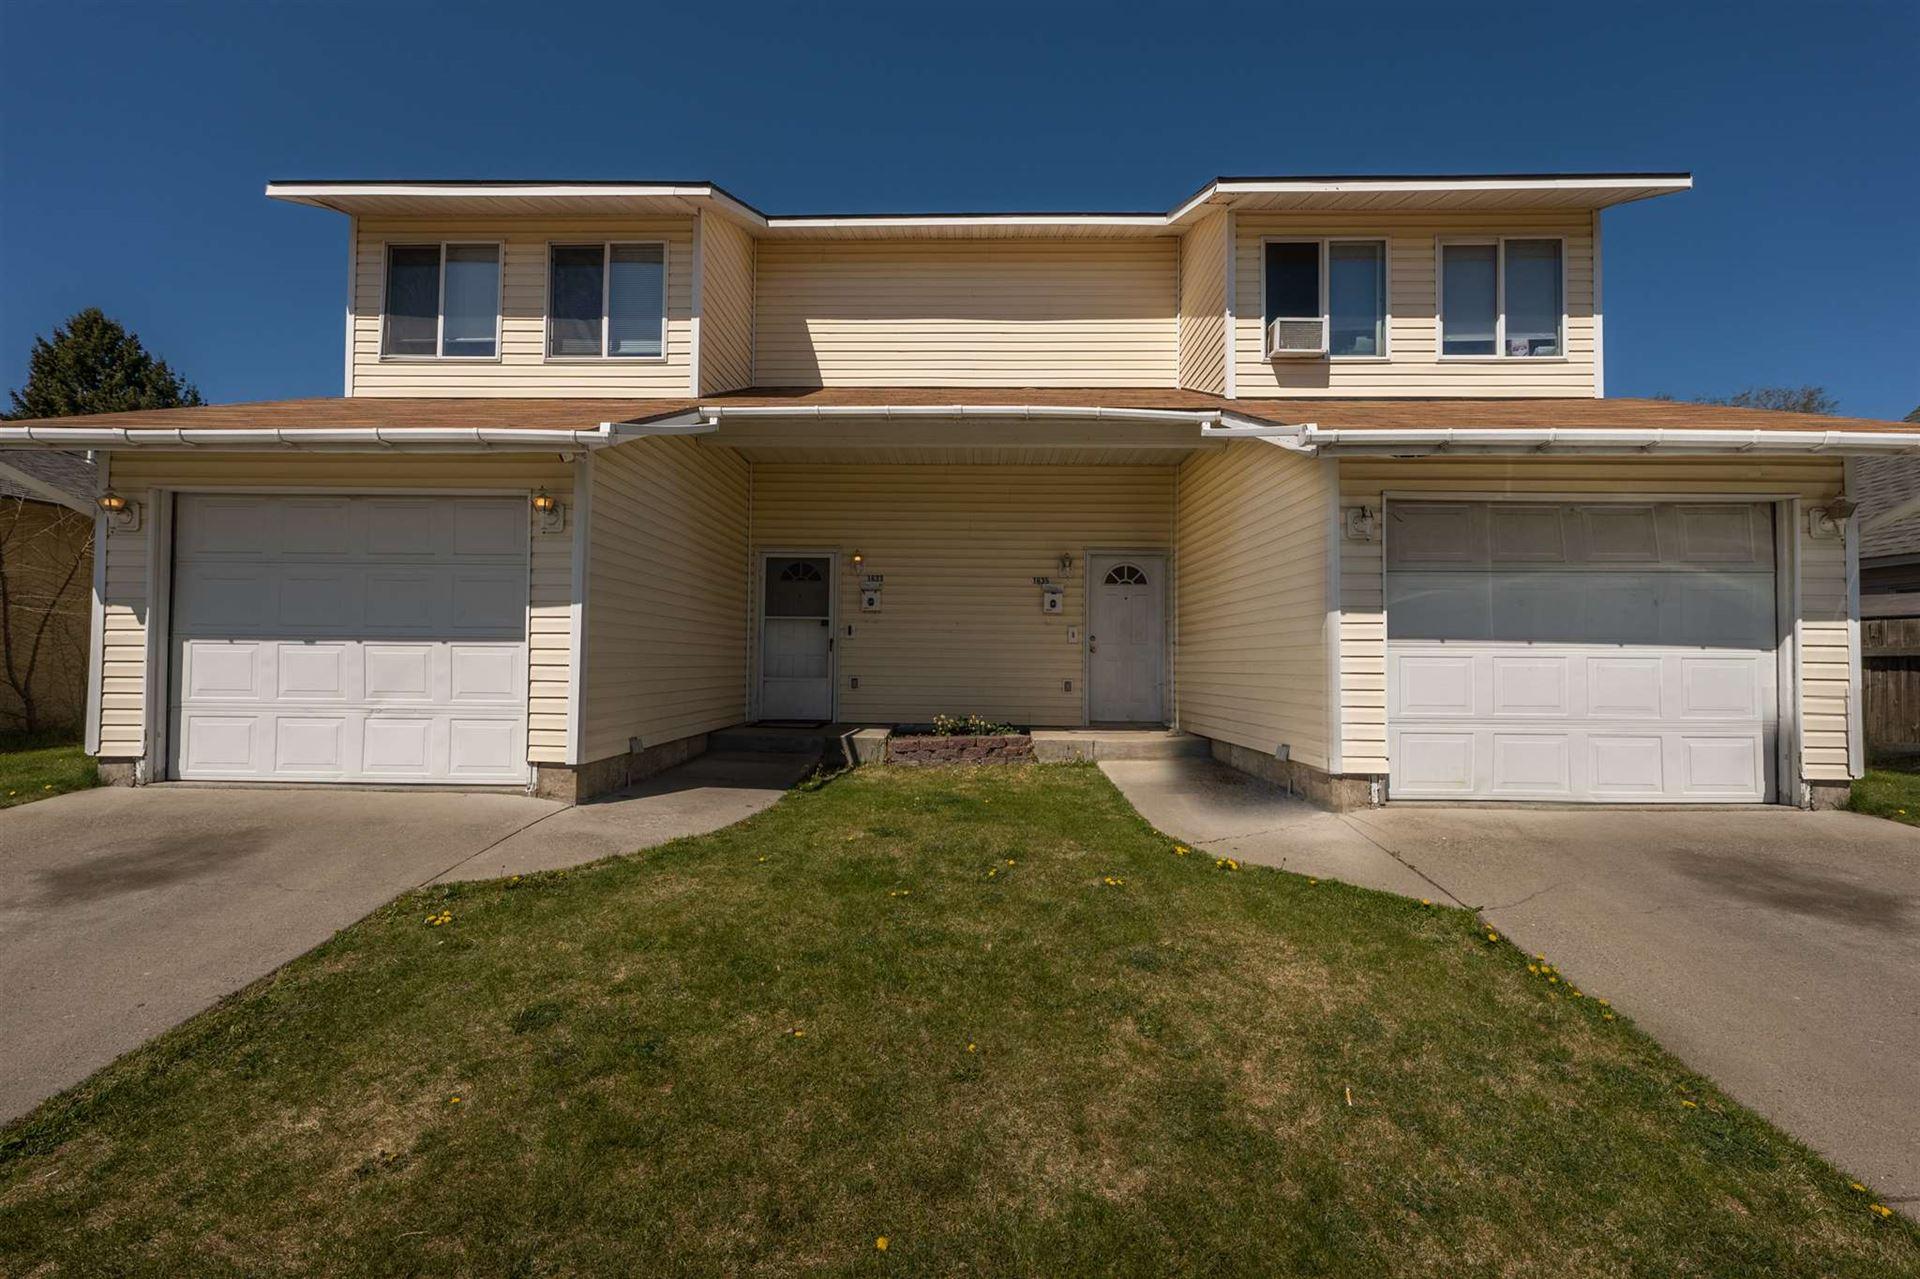 1633 E Wabash Ave #1635, Spokane, WA 99207 - #: 202114254